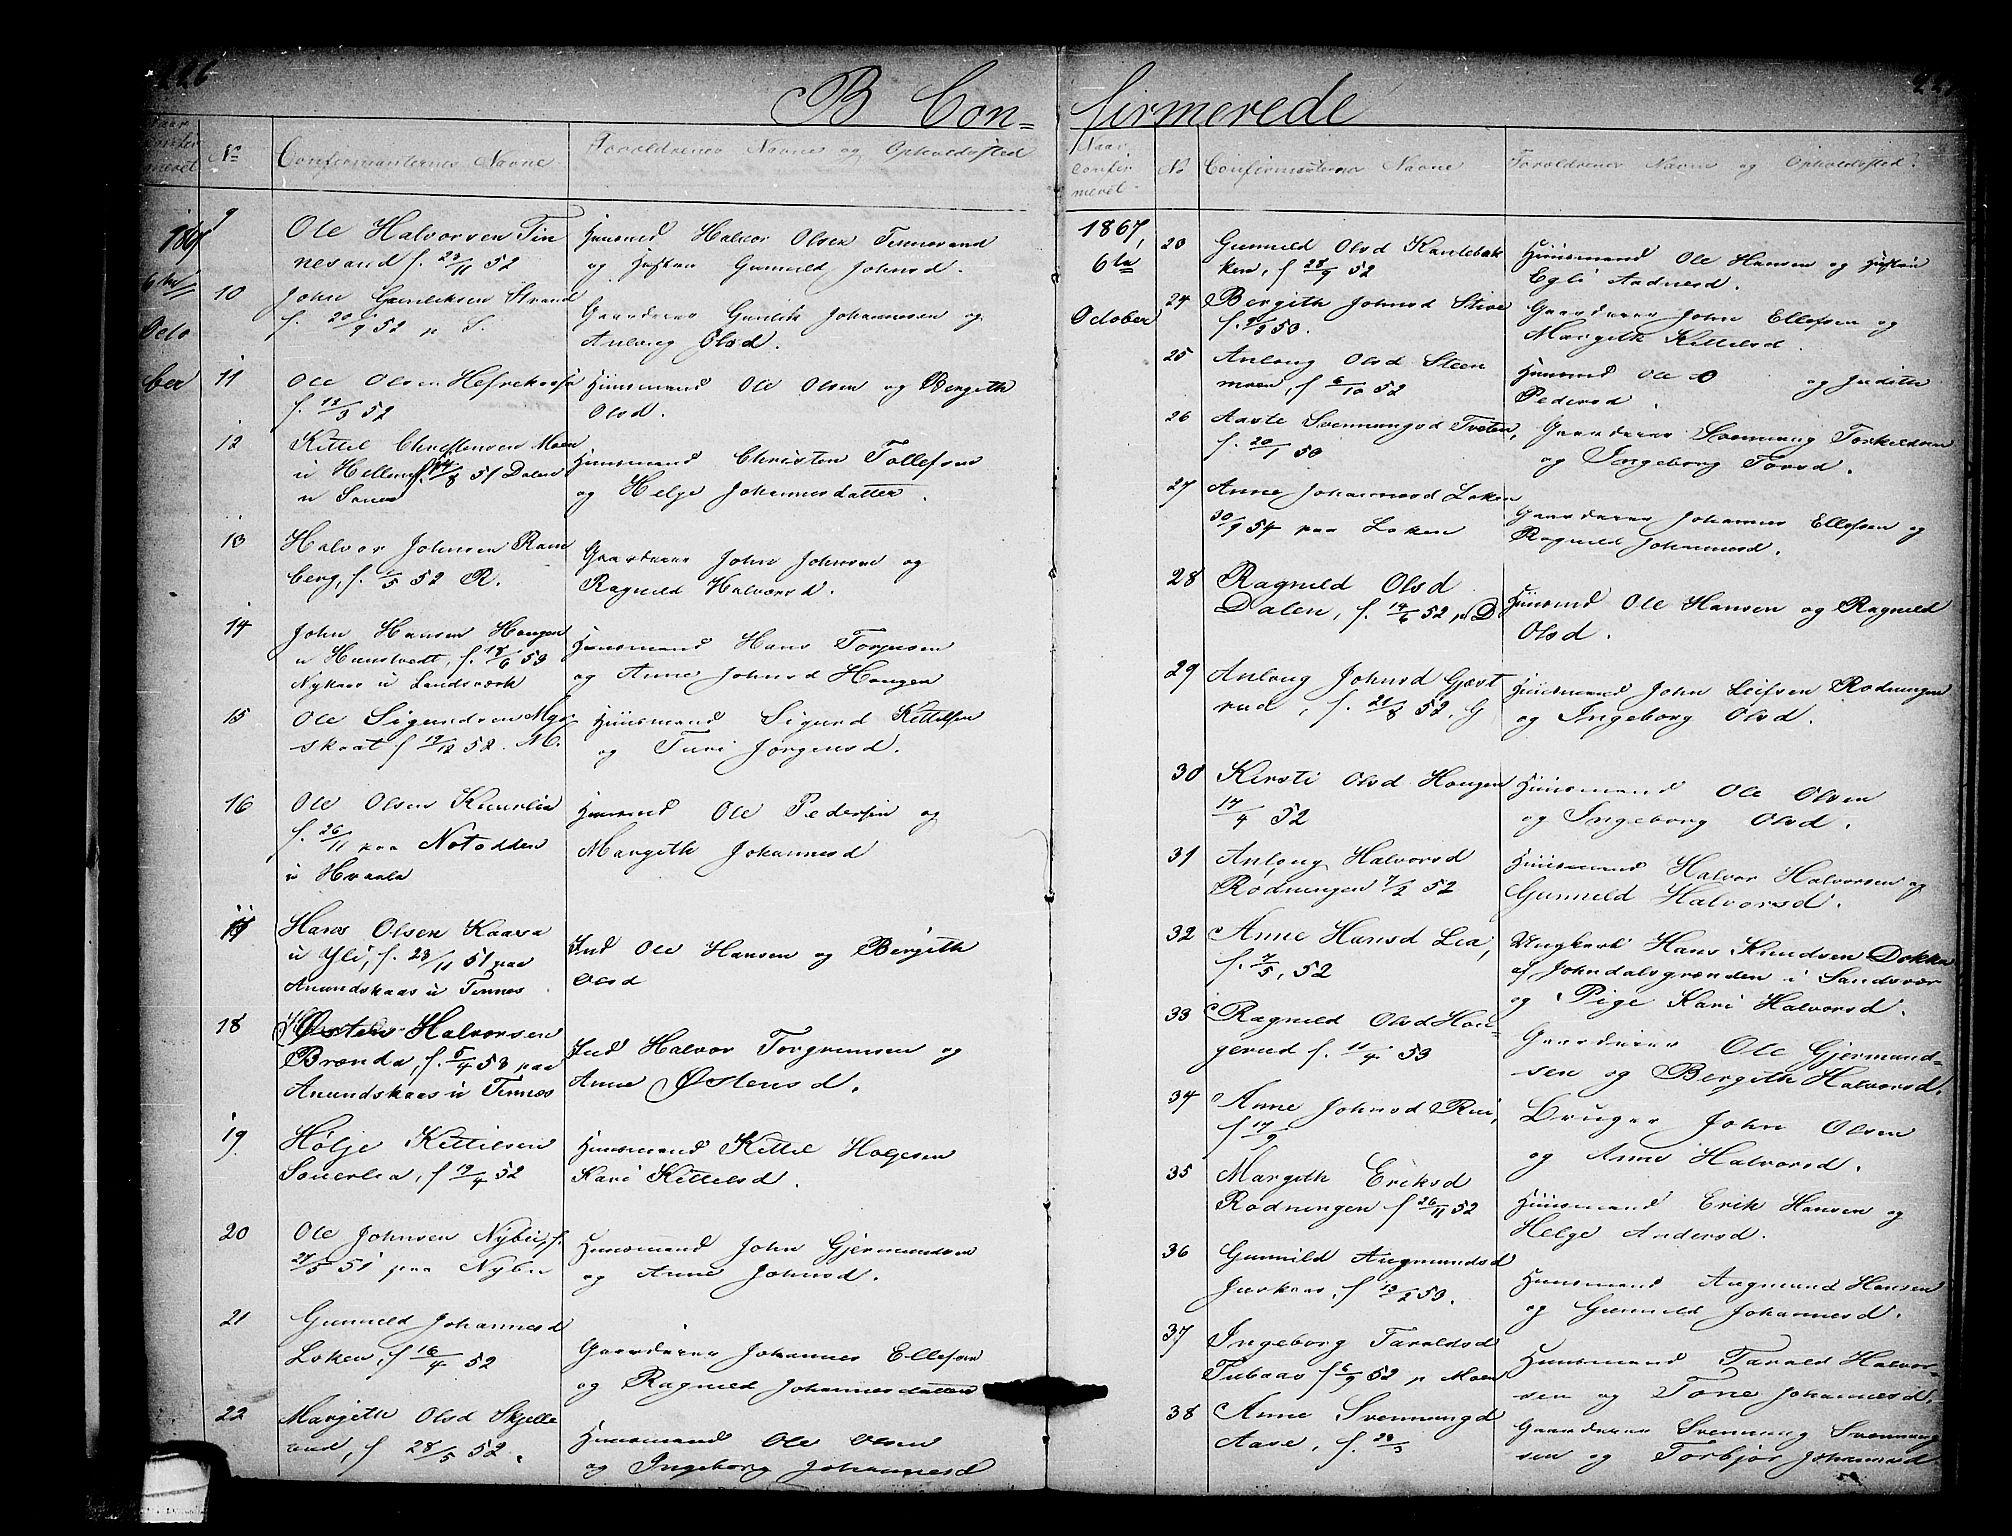 SAKO, Heddal kirkebøker, G/Ga/L0001: Klokkerbok nr. I 1, 1866-1878, s. 226-227